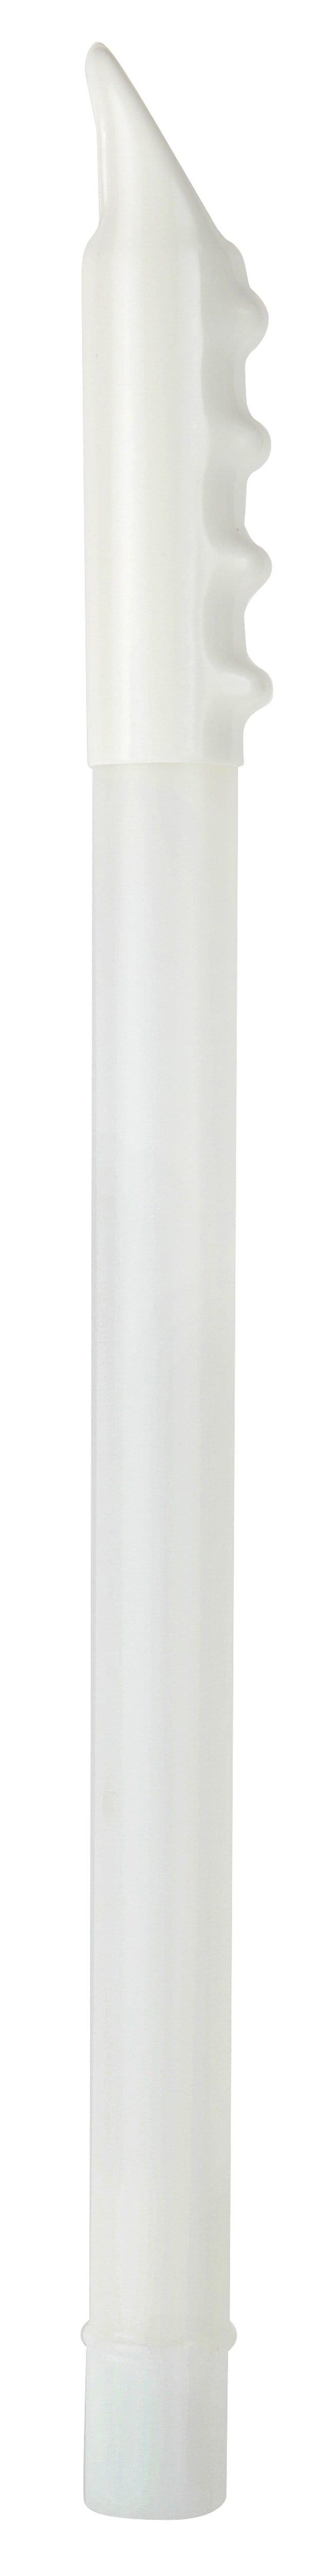 Dynalon™HDPE Handles for Liquid Sampling and Stirrer Kits